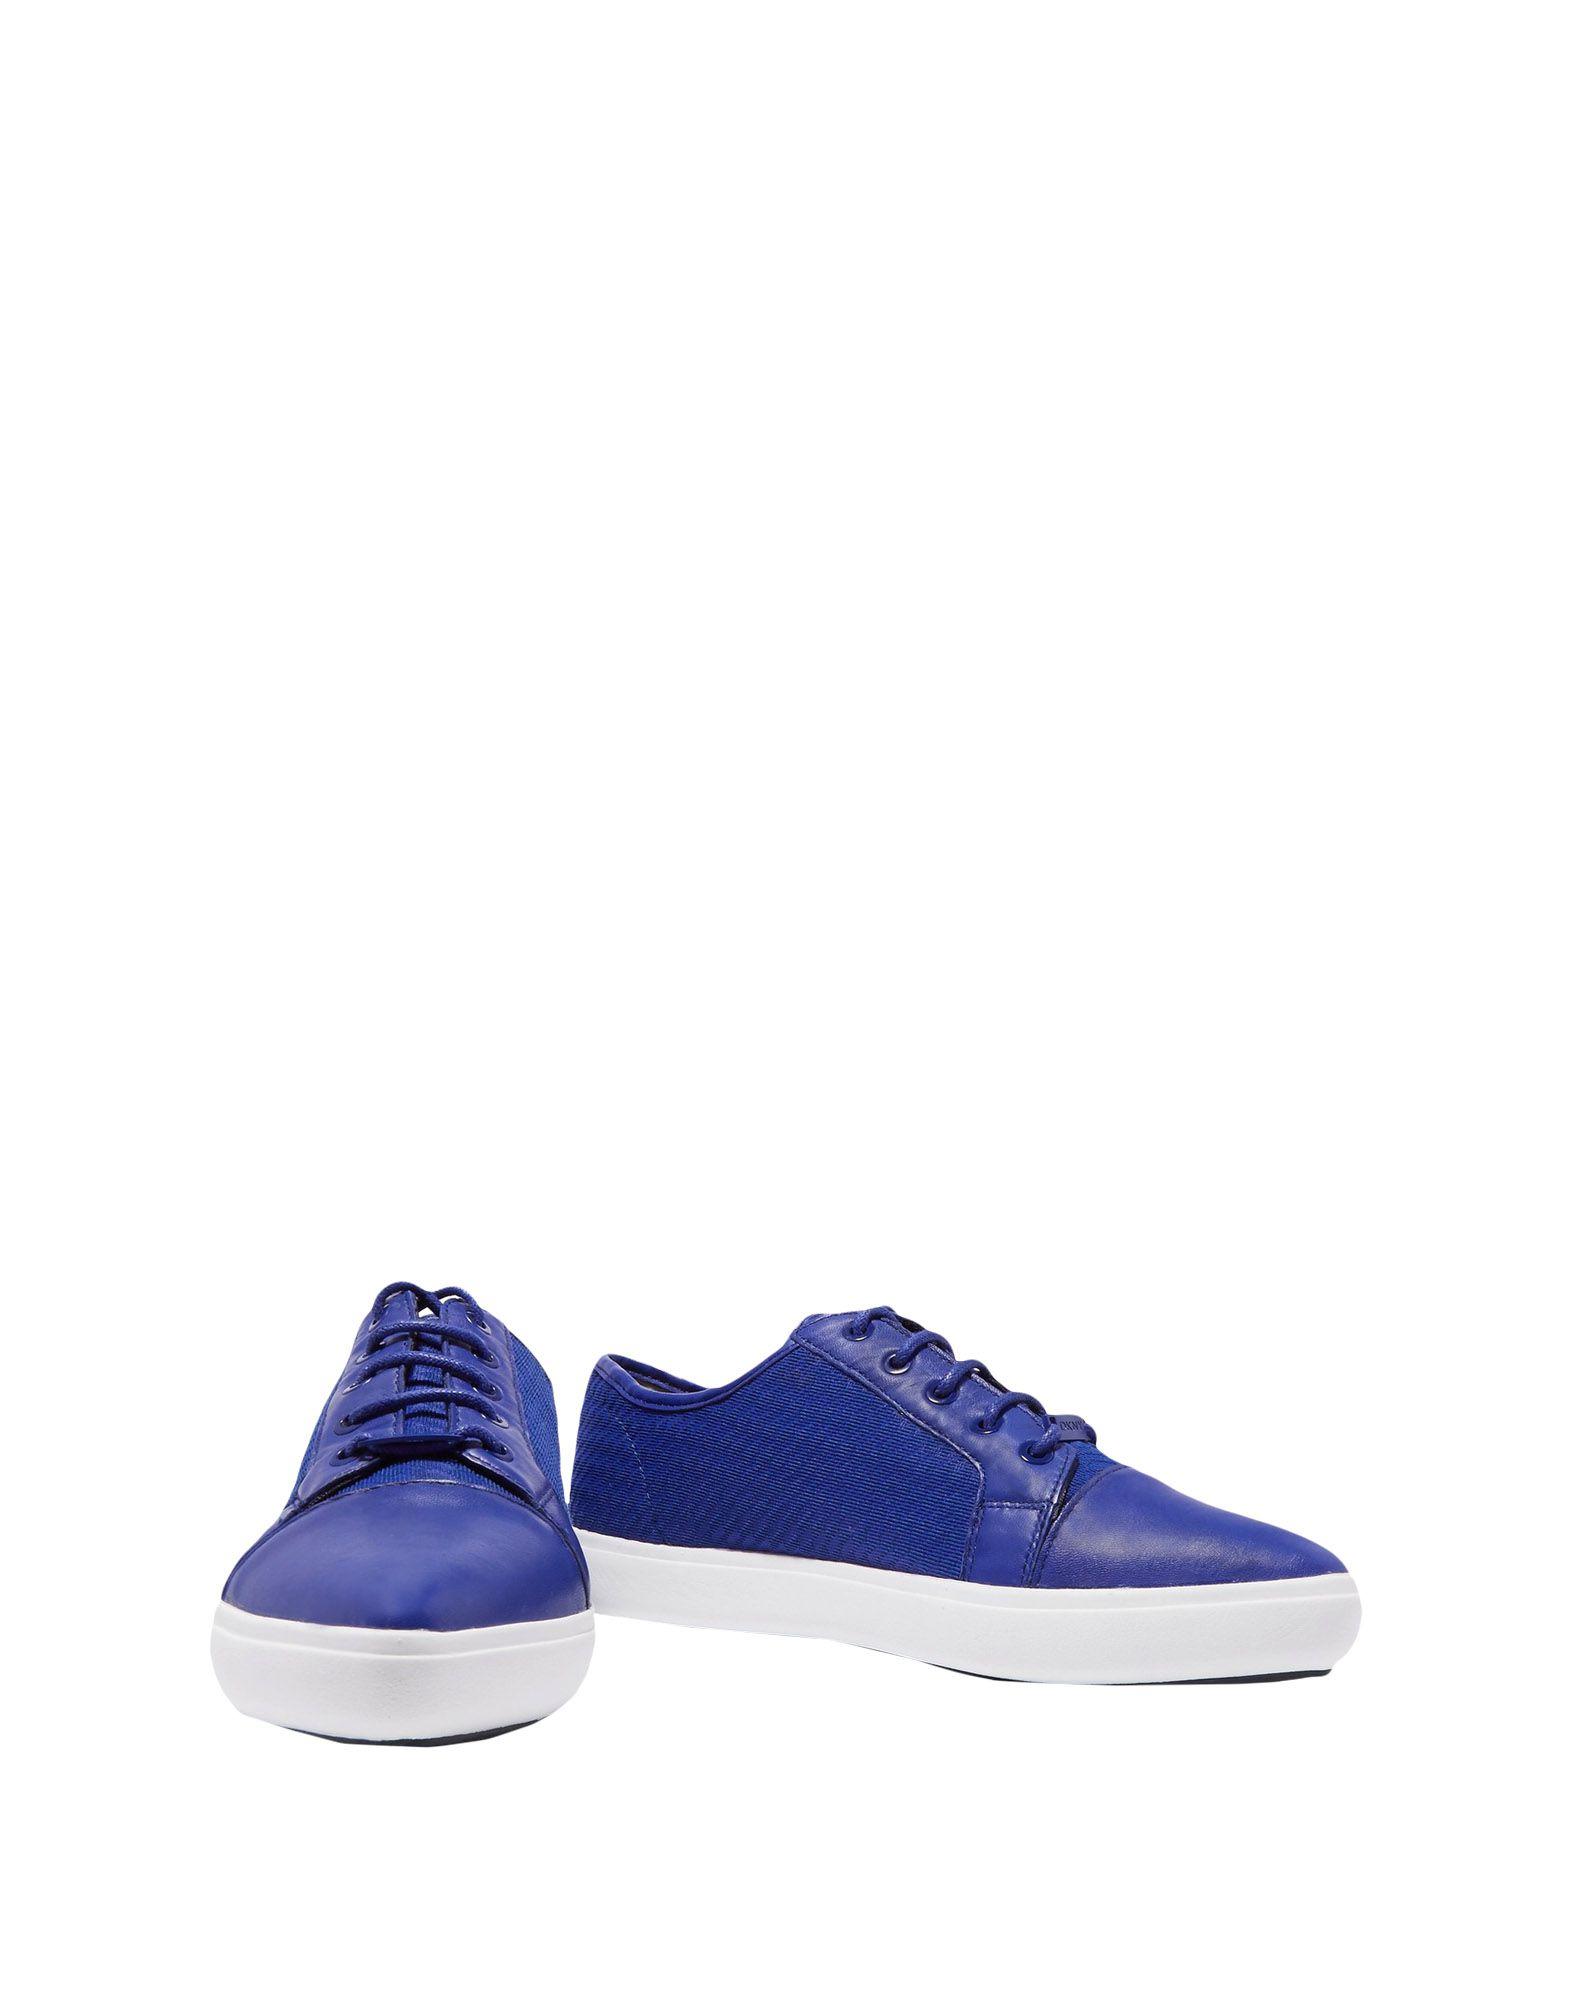 Dkny Sneakers - Women Dkny United Sneakers online on  United Dkny Kingdom - 11514840LH e2ae53